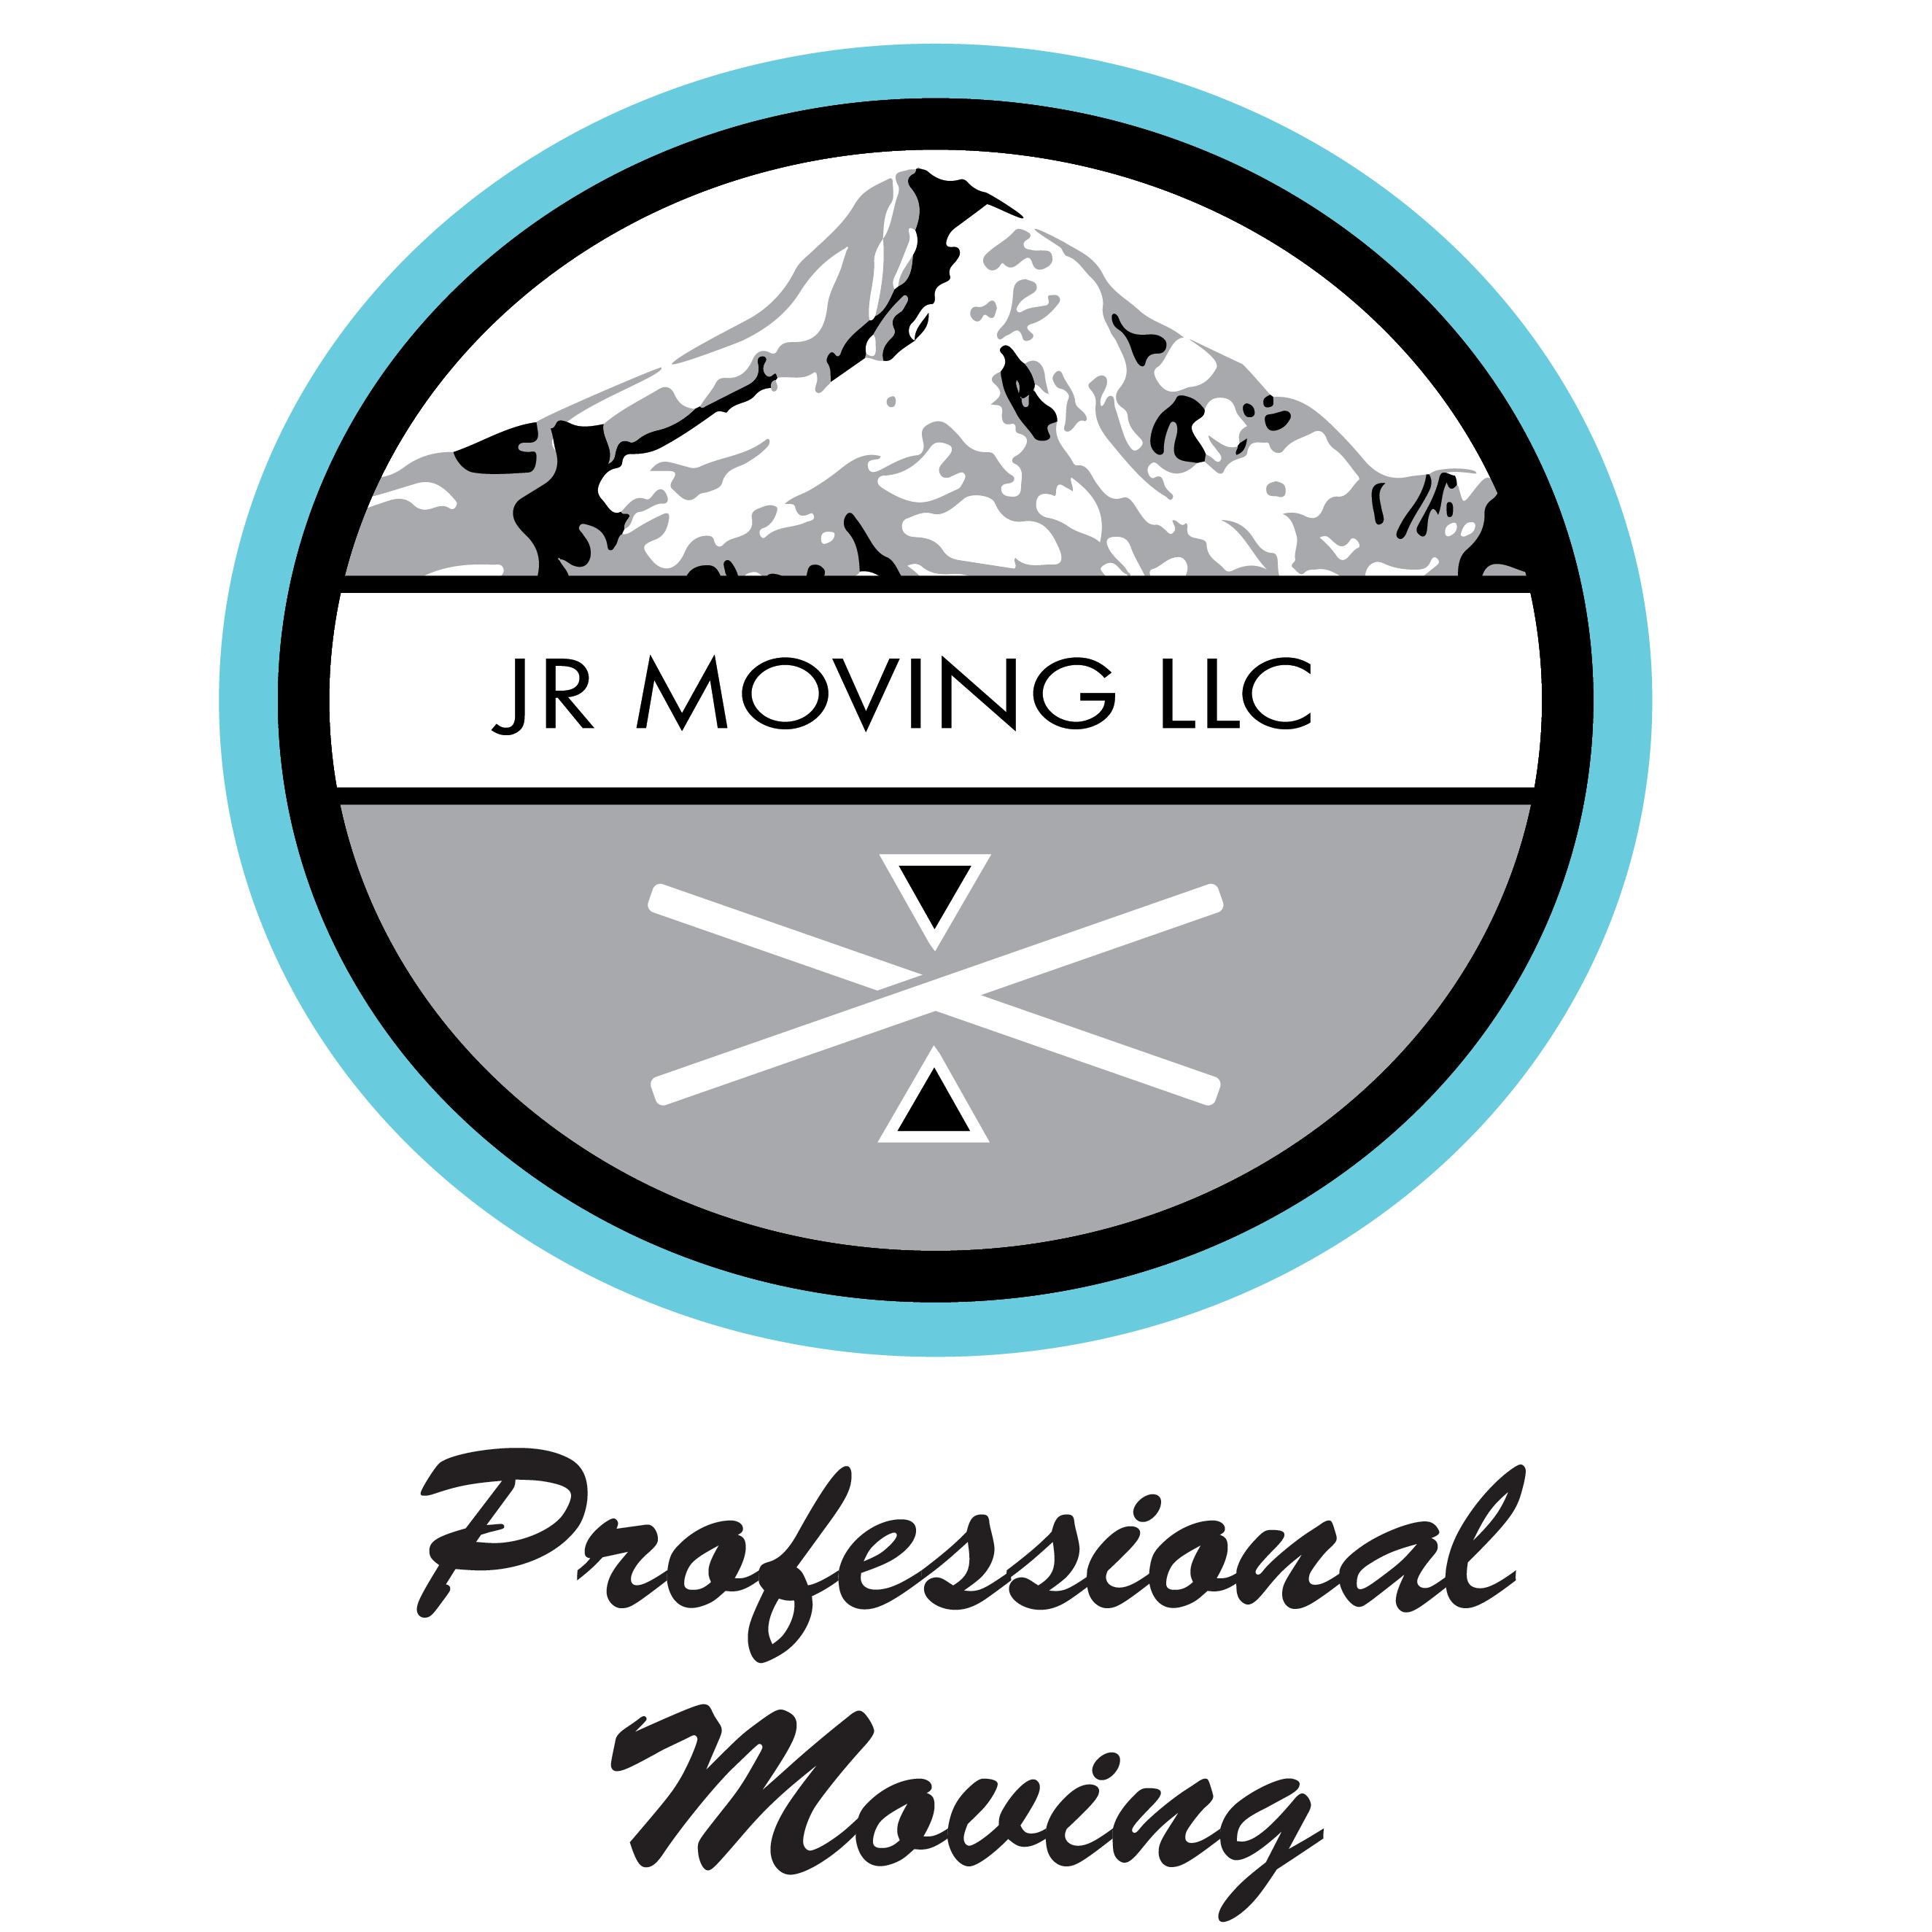 JR Moving LLC